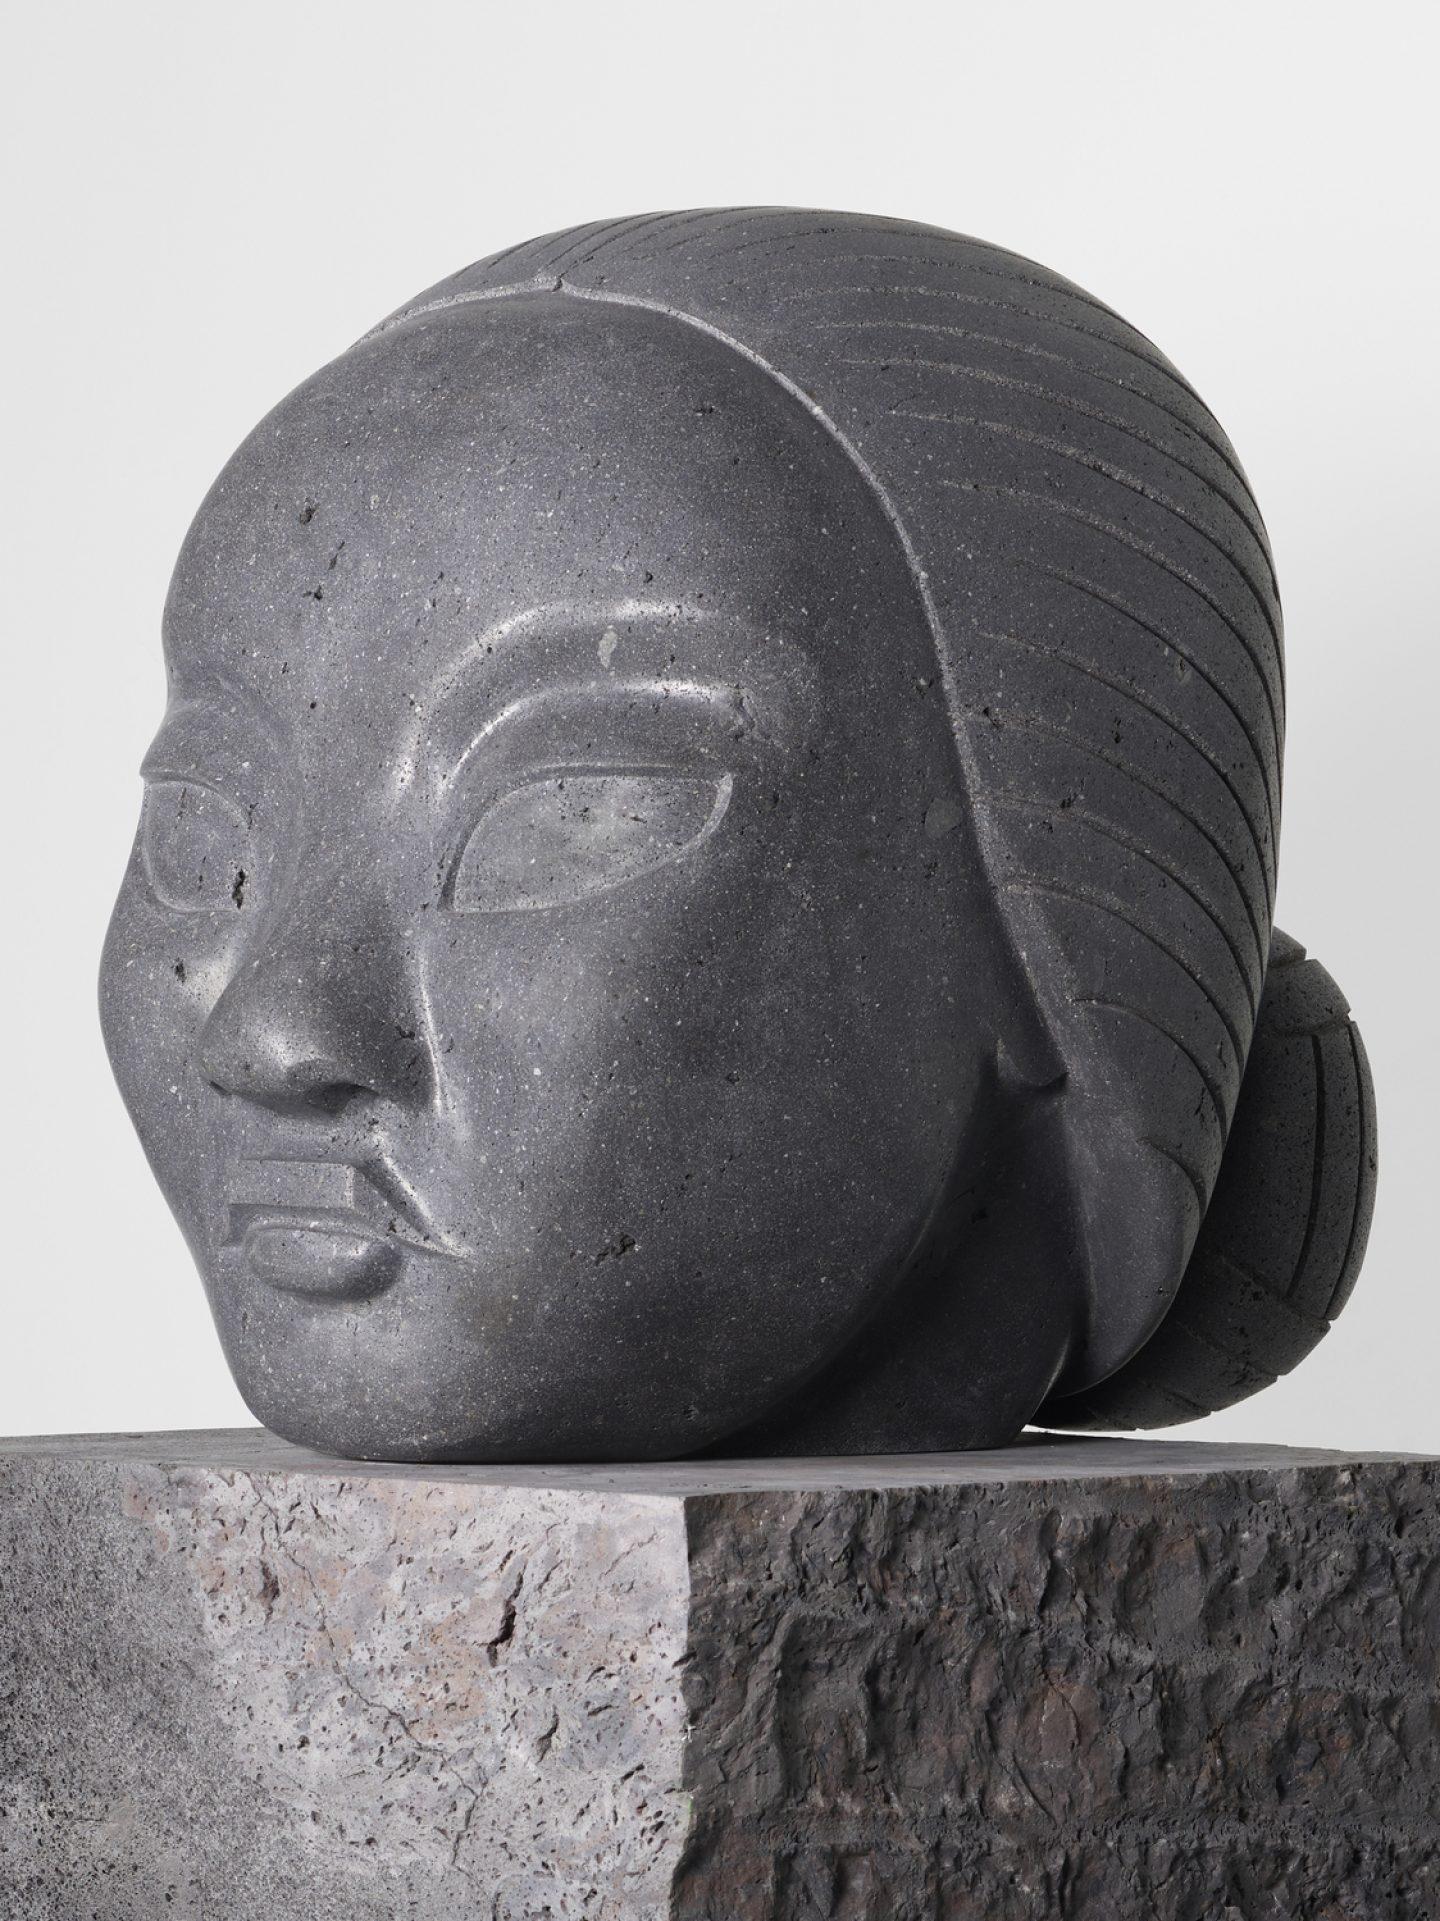 IGNANT-ART-Sculpture-Reyes-18